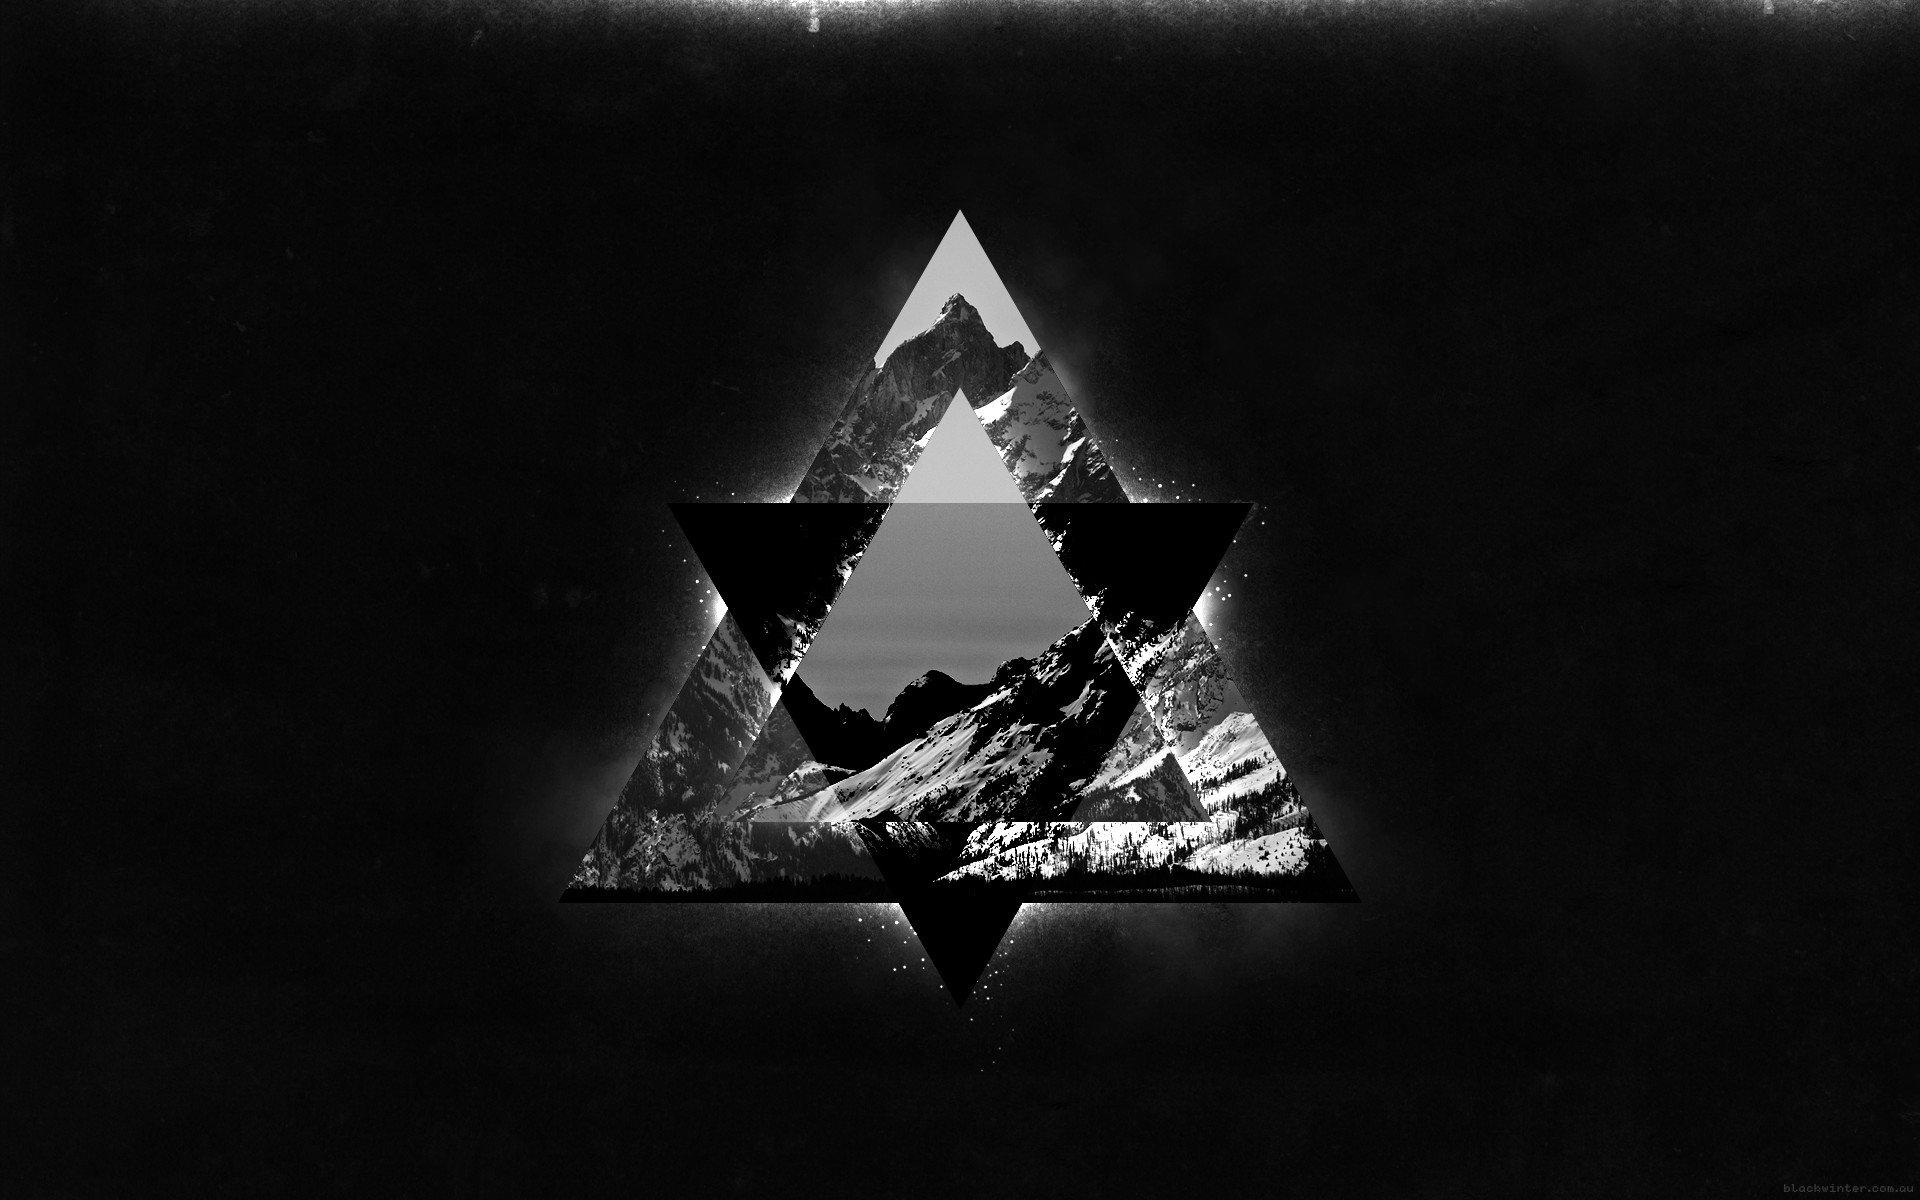 Good Wallpaper Mountain Triangle - 102257-geometry-triangle-mountains-dark  Snapshot_839138.jpg